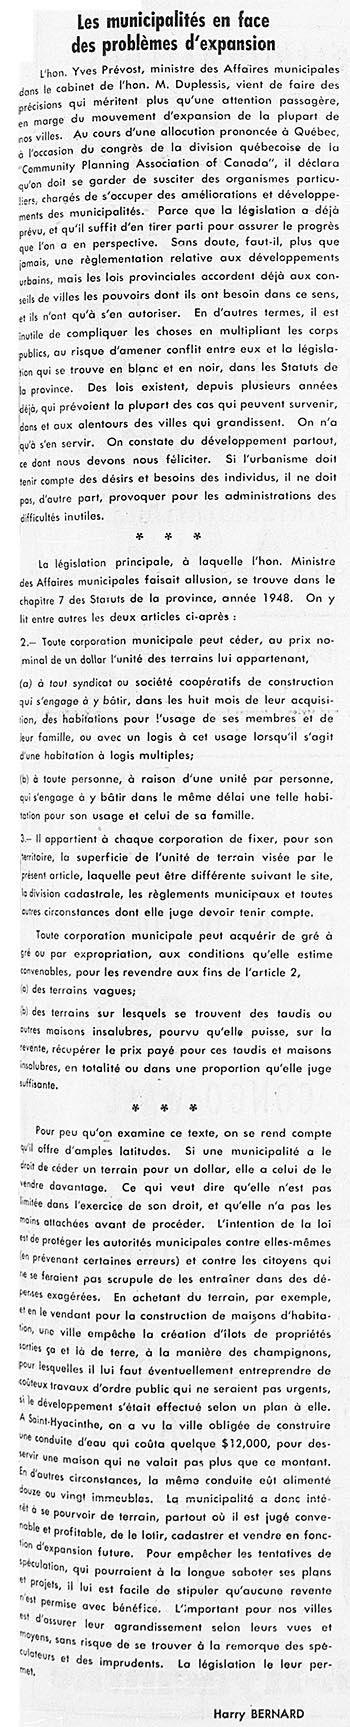 edito_9octobre1953_350